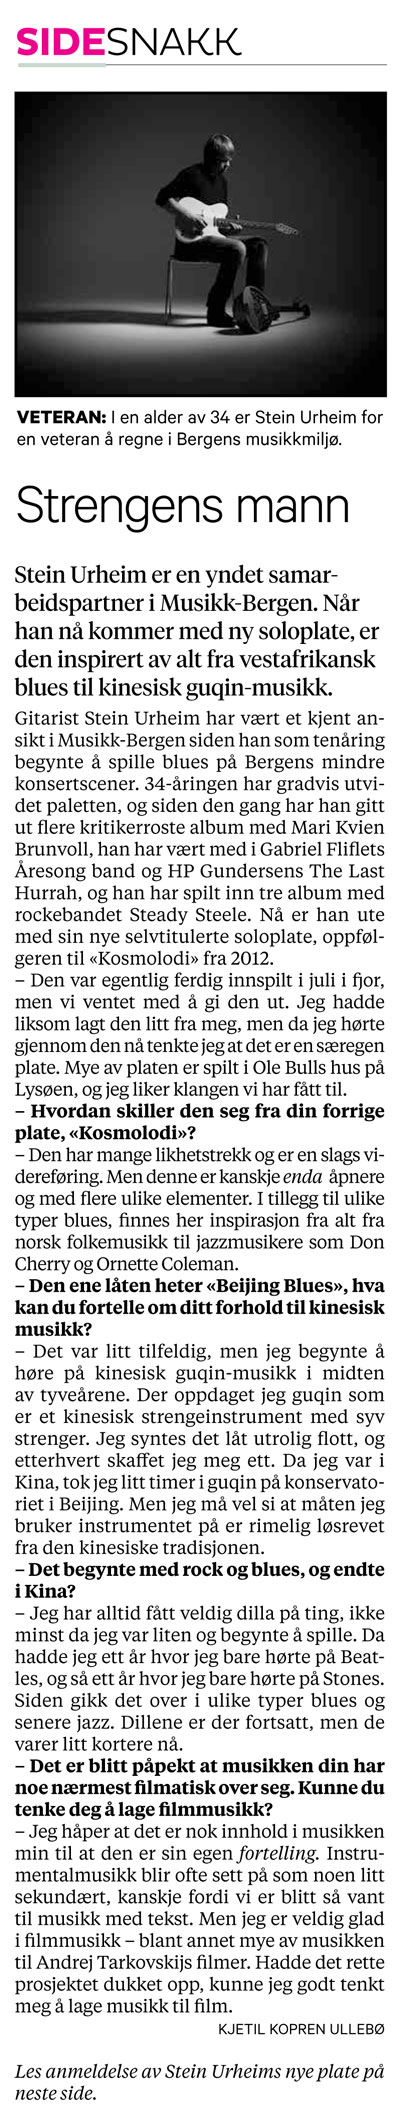 Interview Bergens Tidende